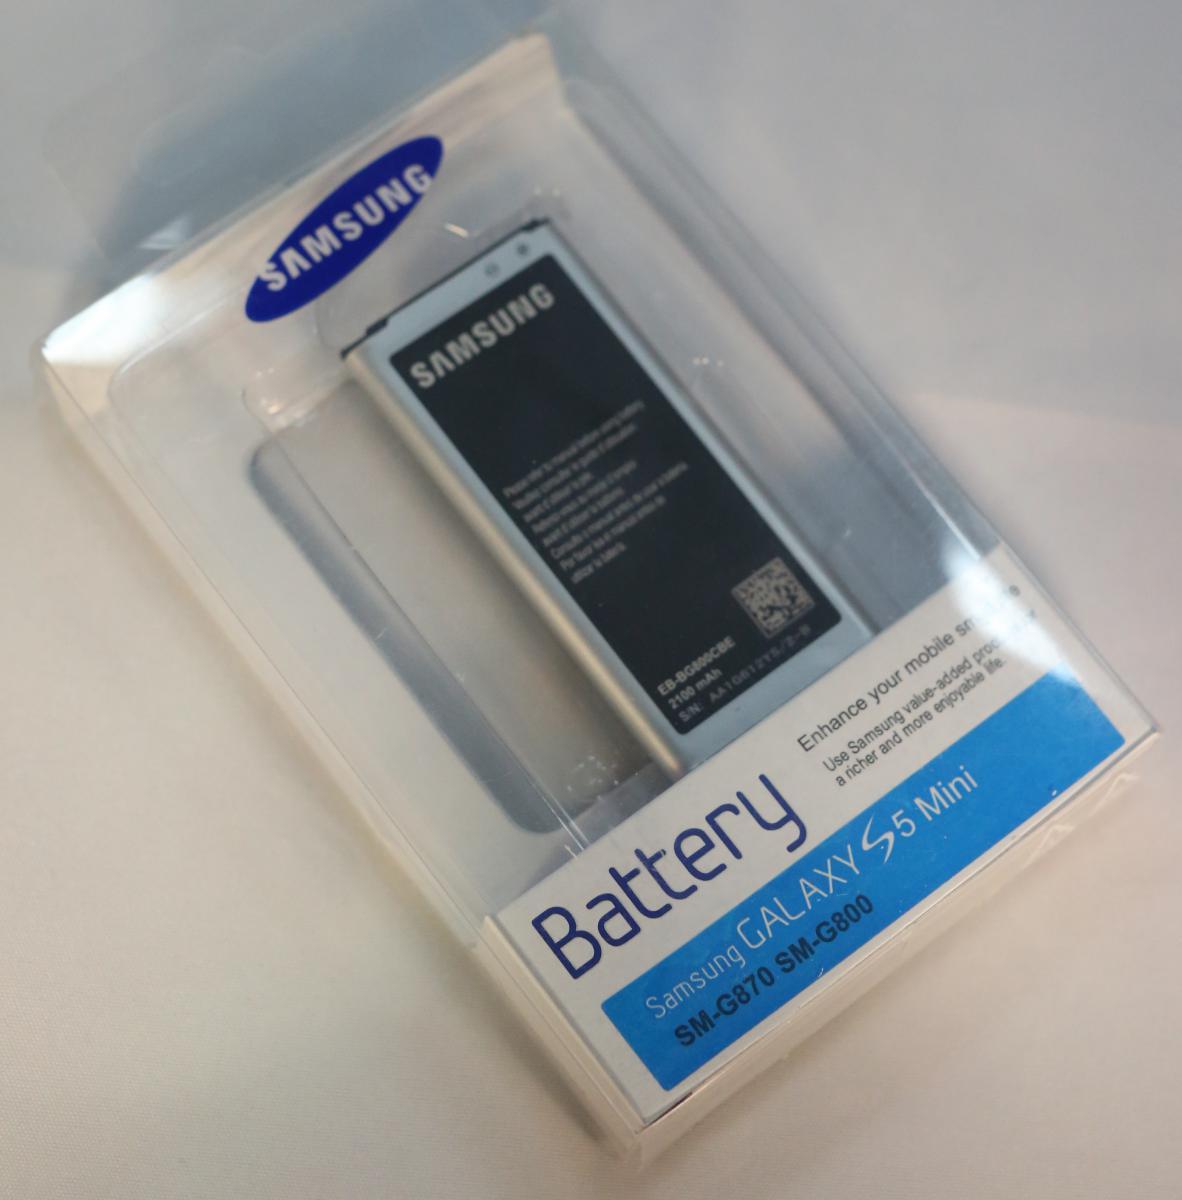 new genuine battery for samsung galaxy s5 mini eb bg800cbe. Black Bedroom Furniture Sets. Home Design Ideas